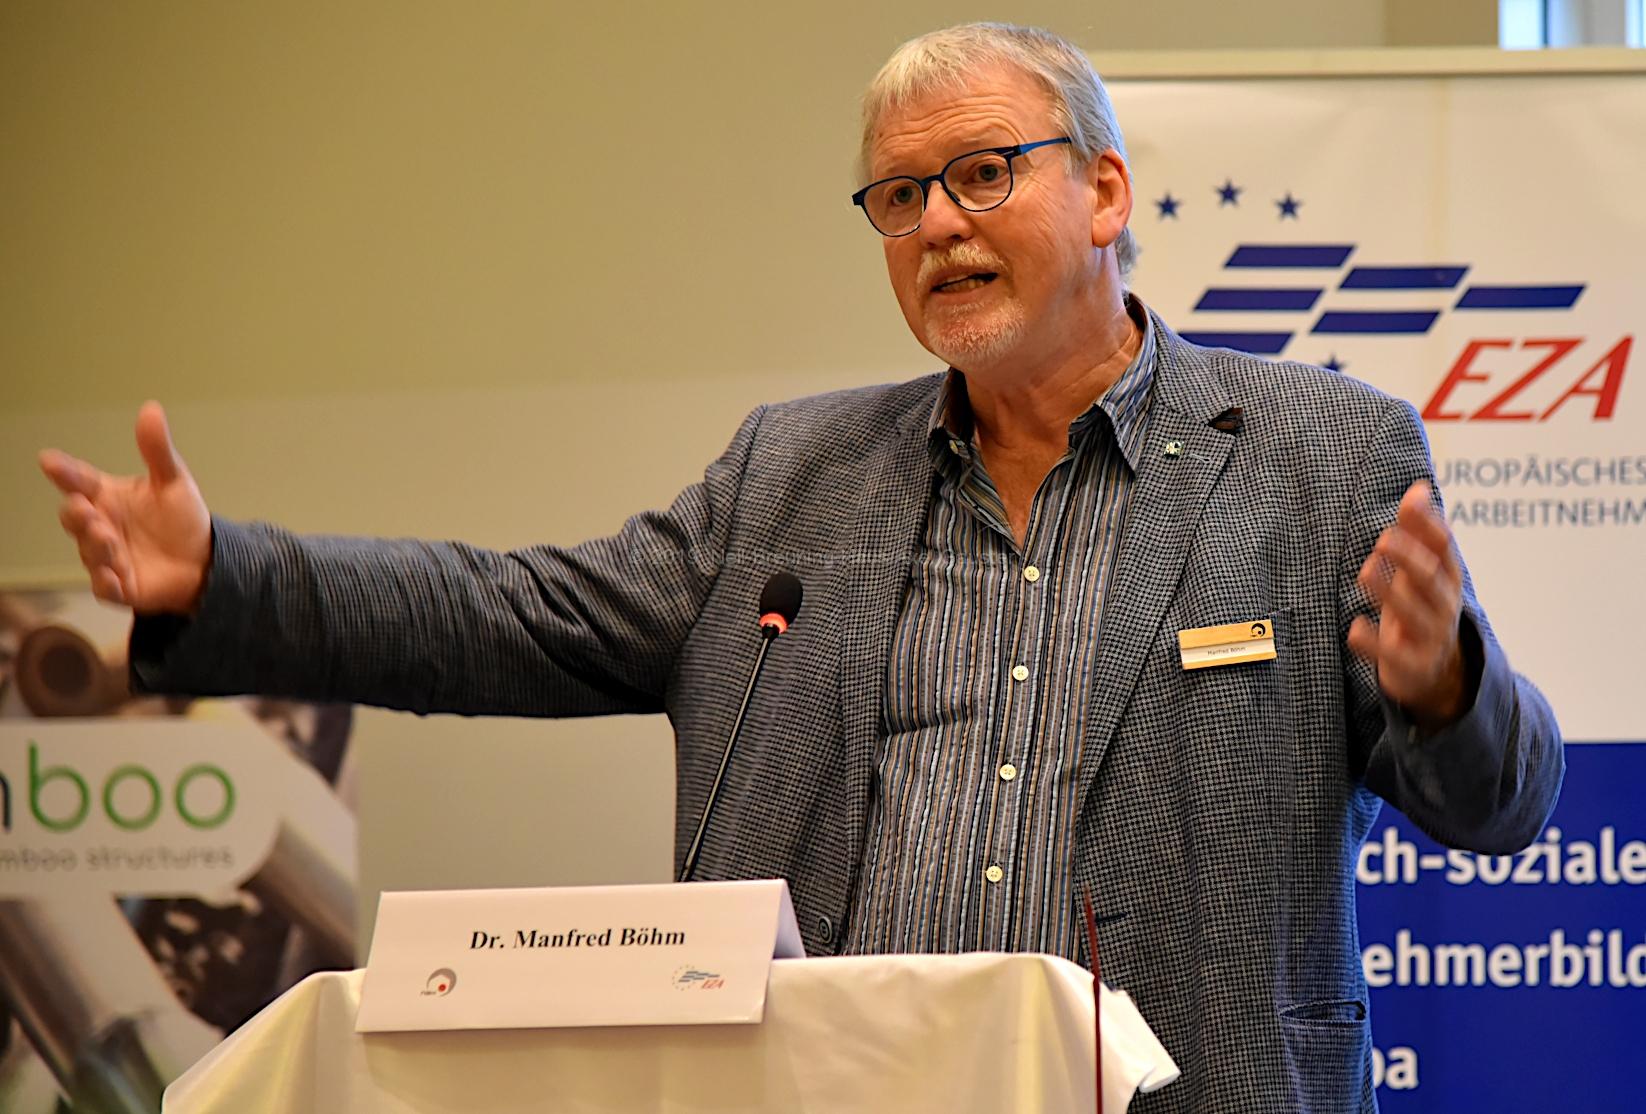 Dr. Manfred Böhm